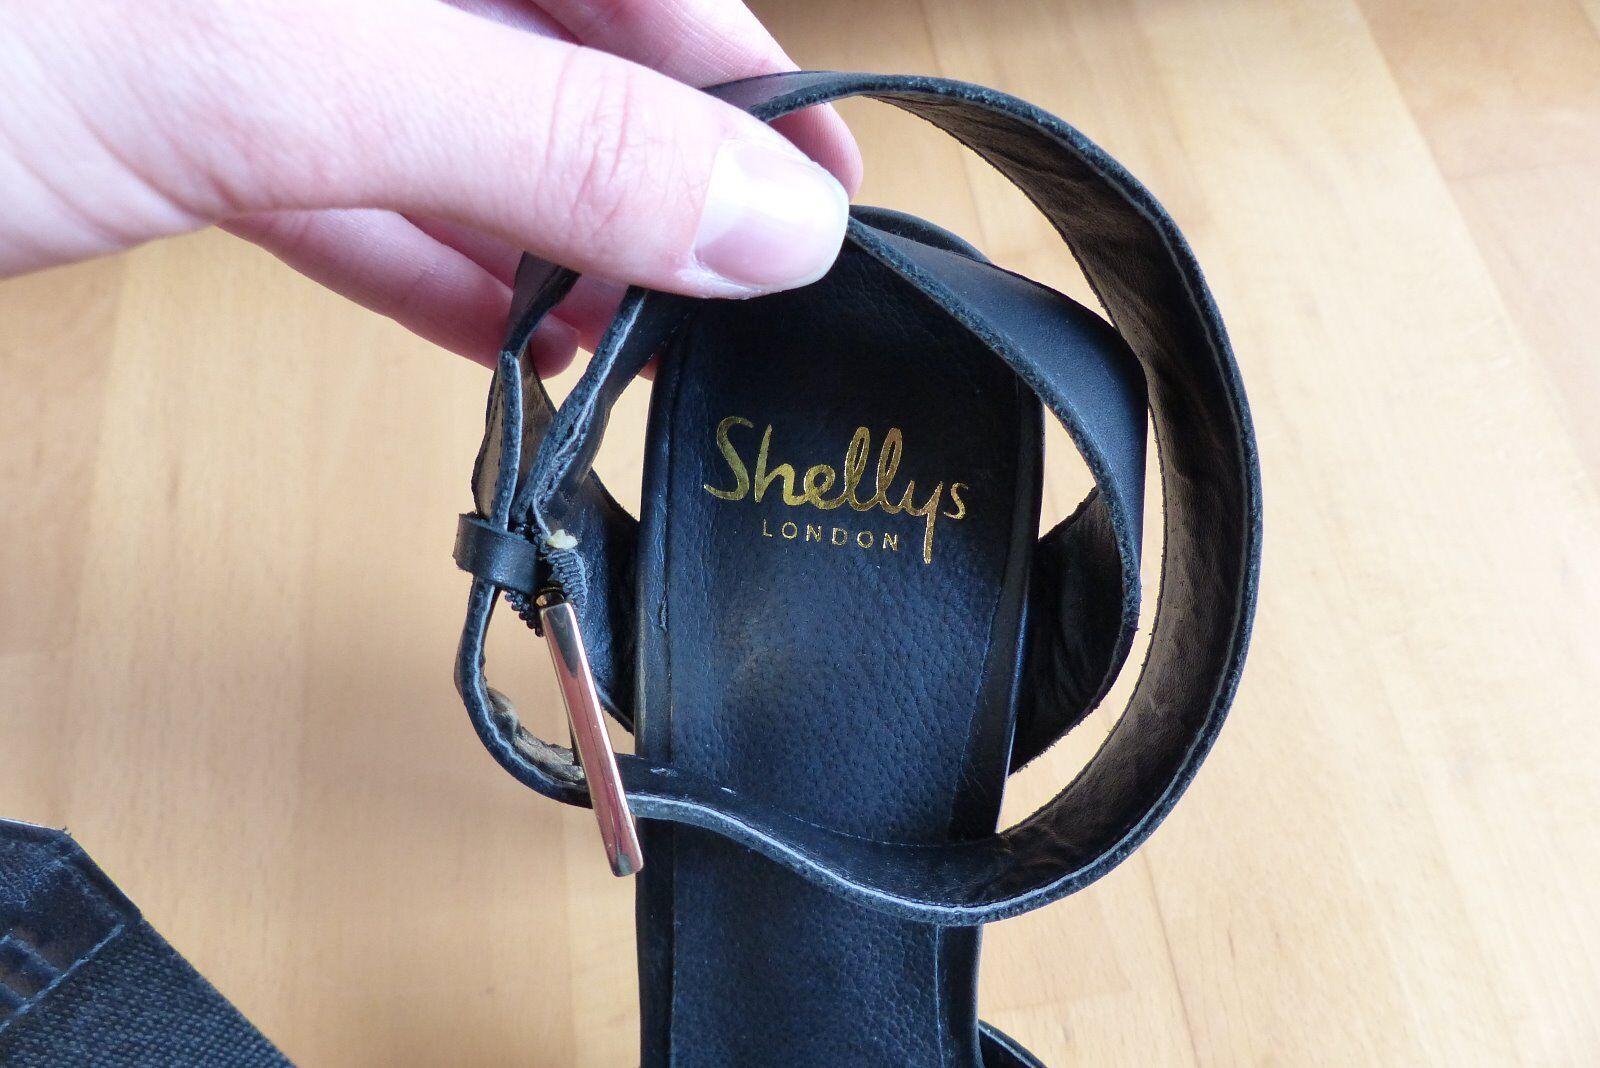 Shellys London Plateau Sandalen schwarz schwarz schwarz Leder EU 38 Neu b19edd